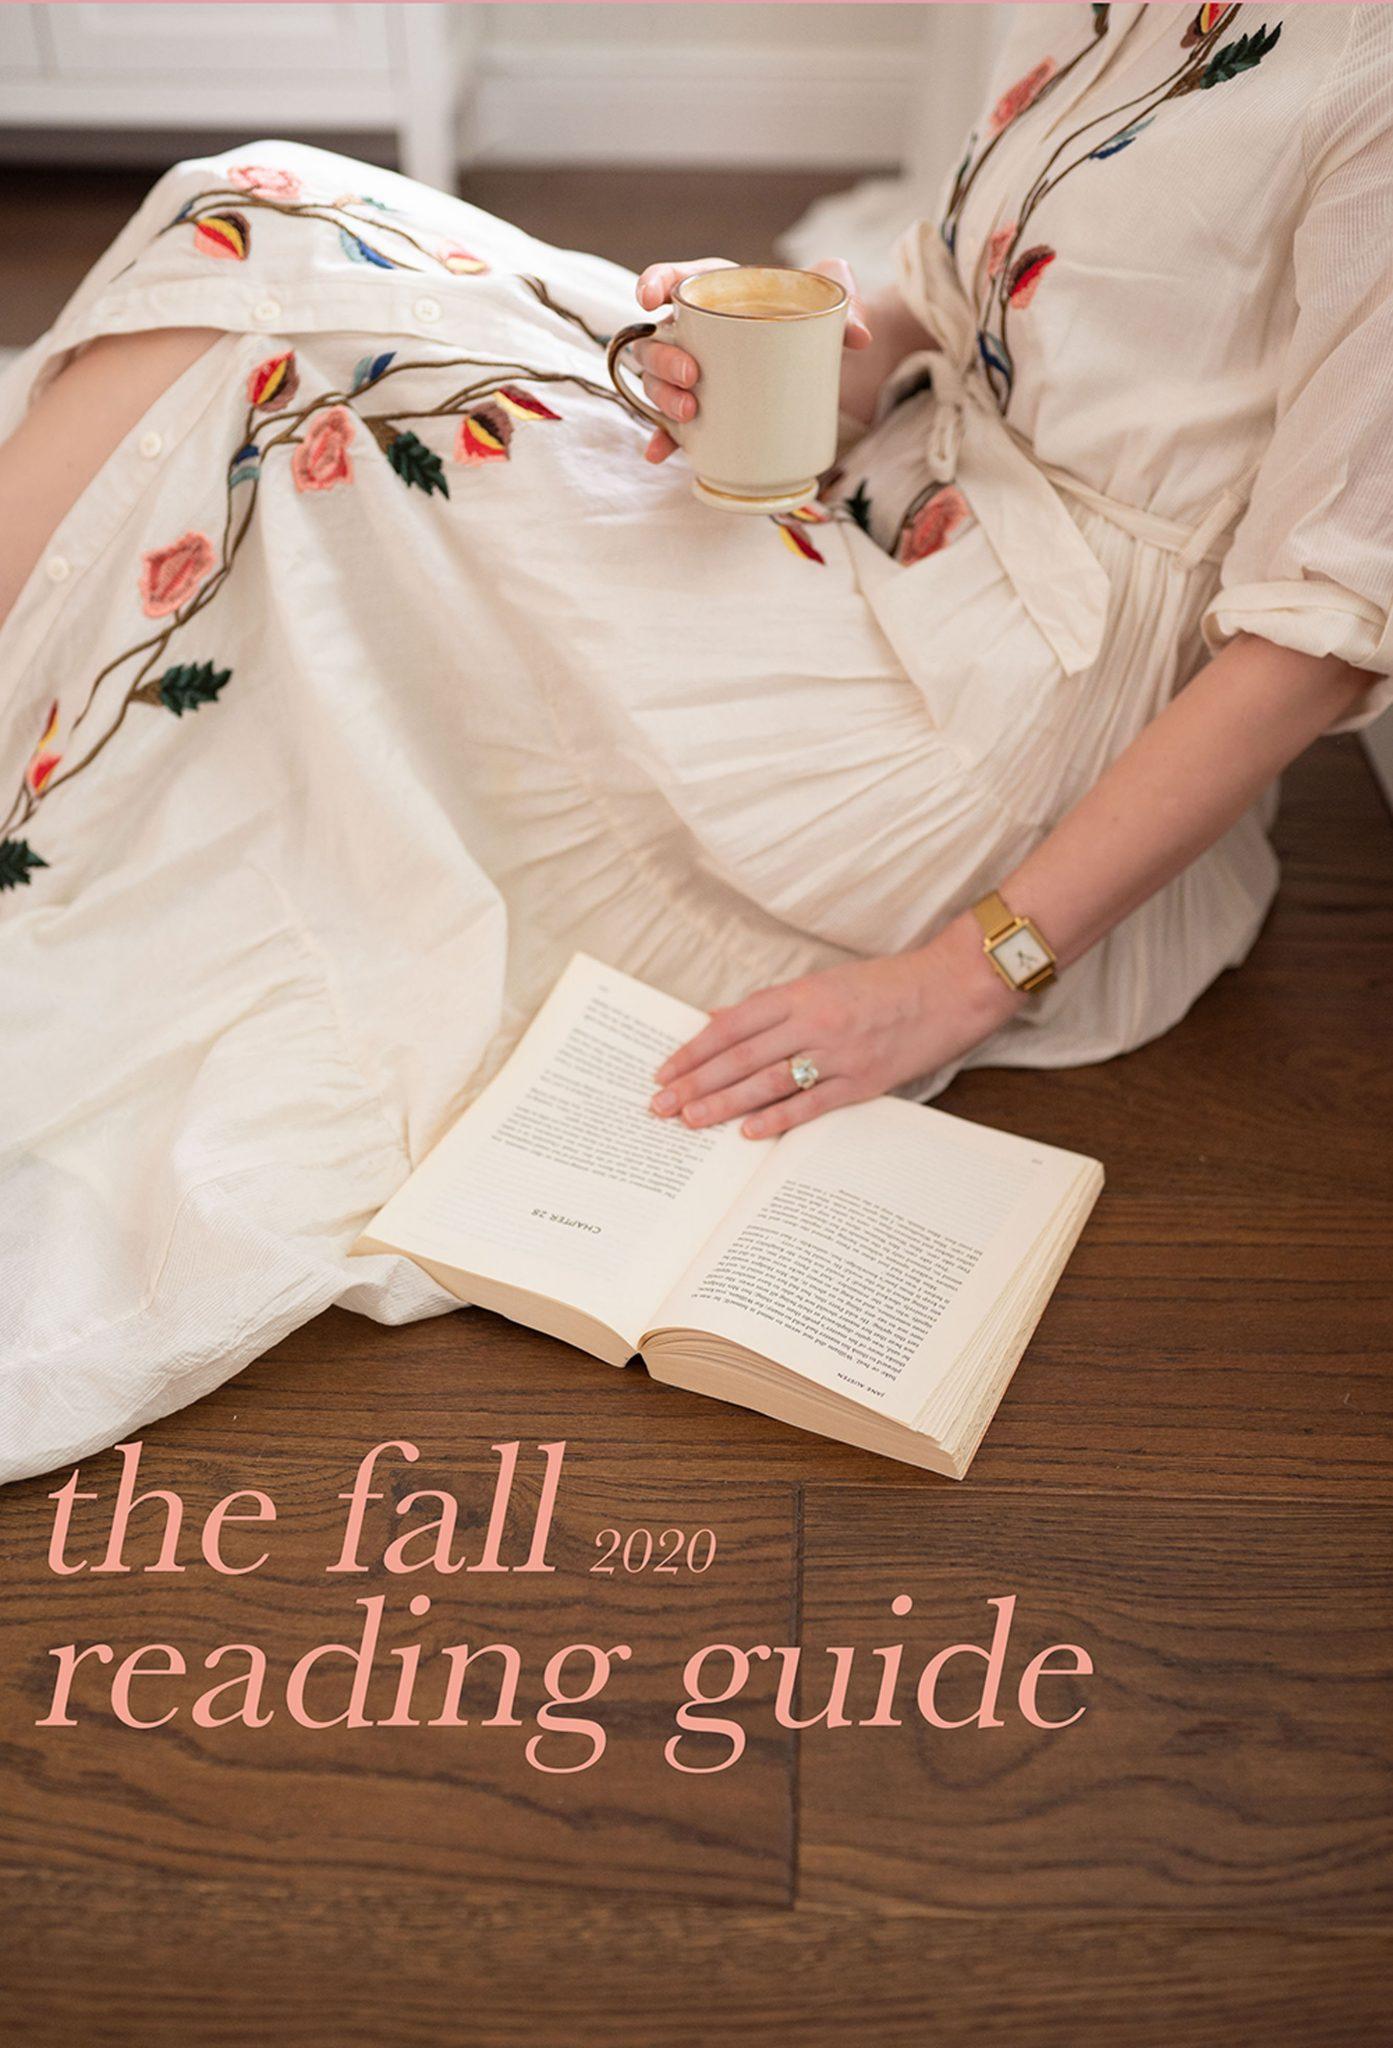 Fall Raading Guide 2020